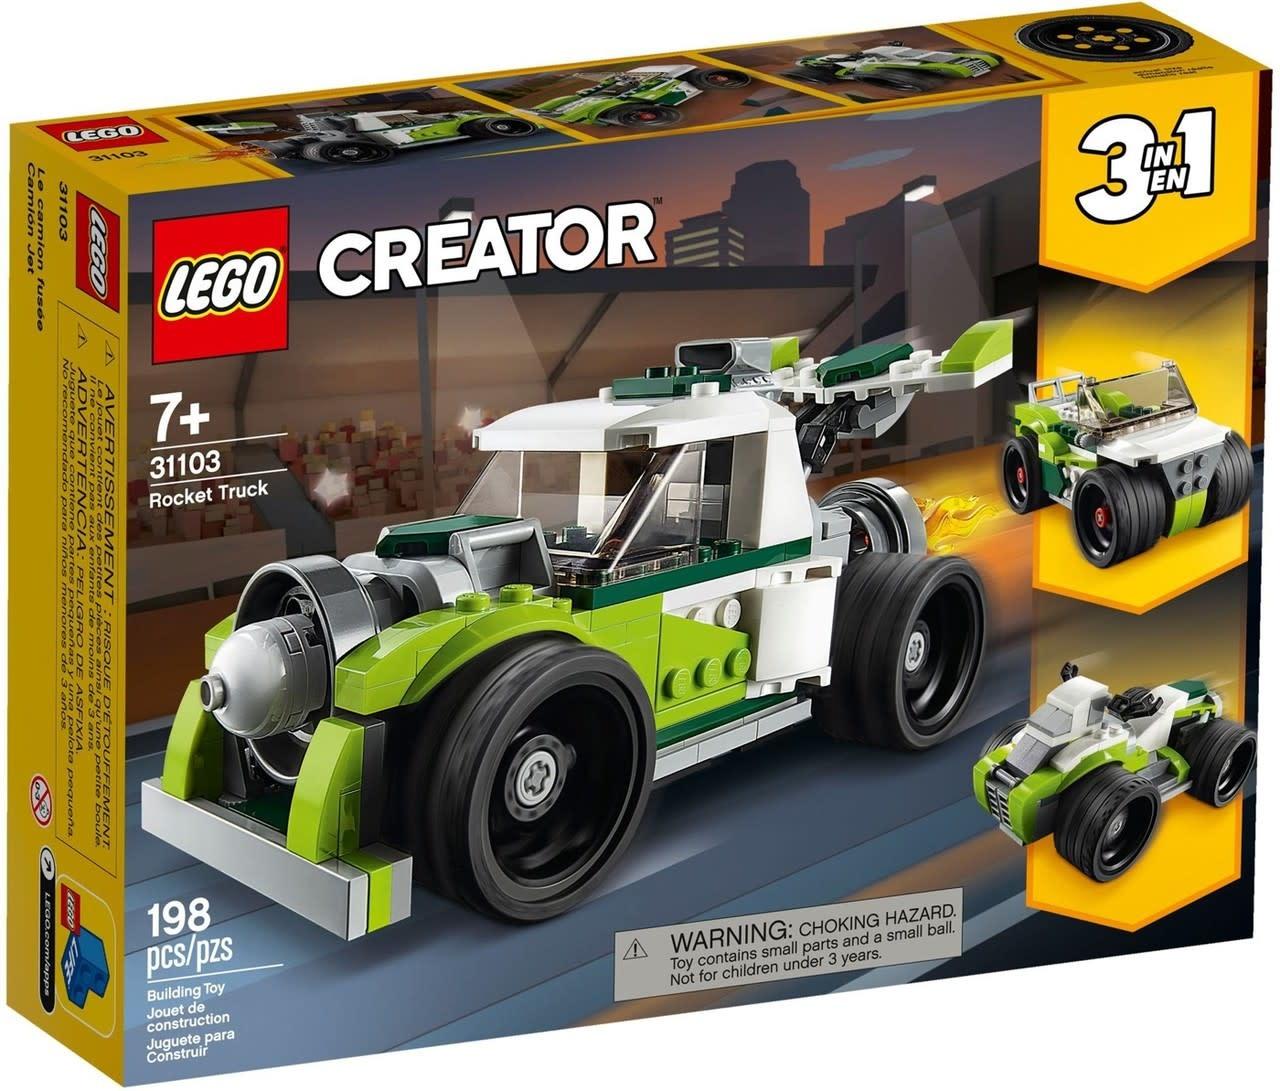 Lego Creator Rocket Truck-1